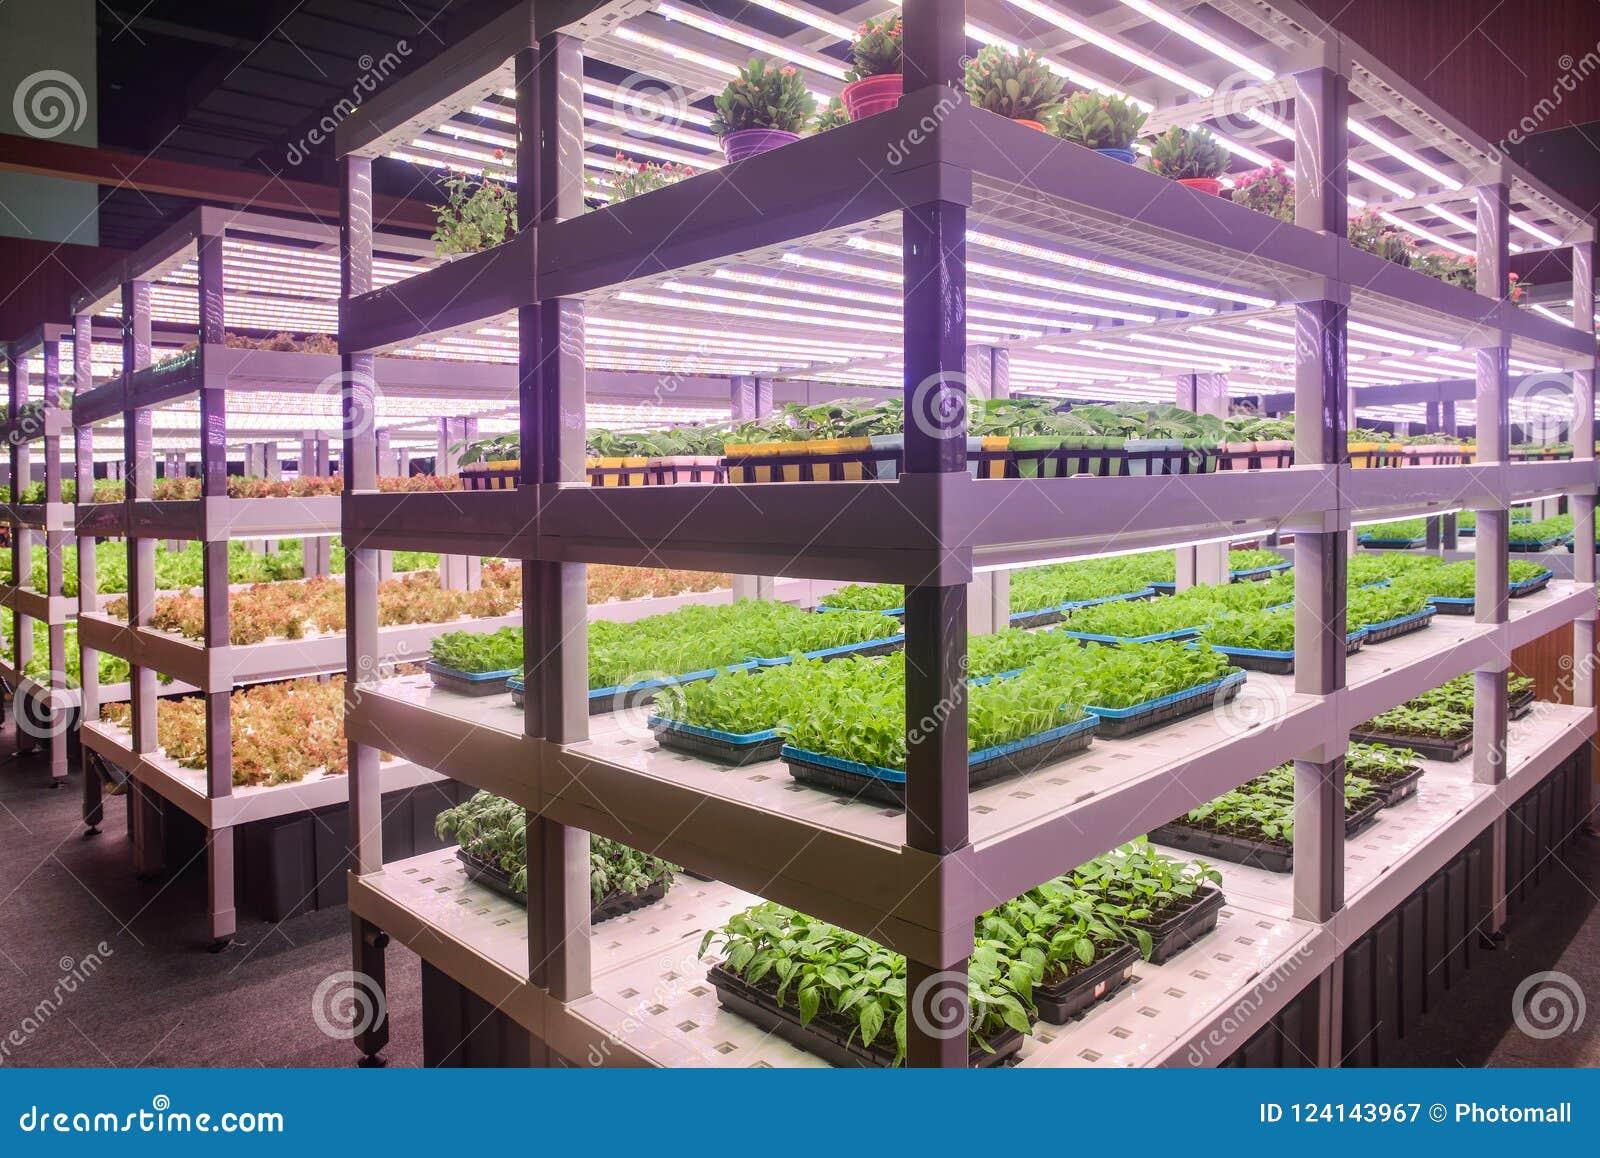 Lâmpada conduzida do crescimento vegetal usada na plântula